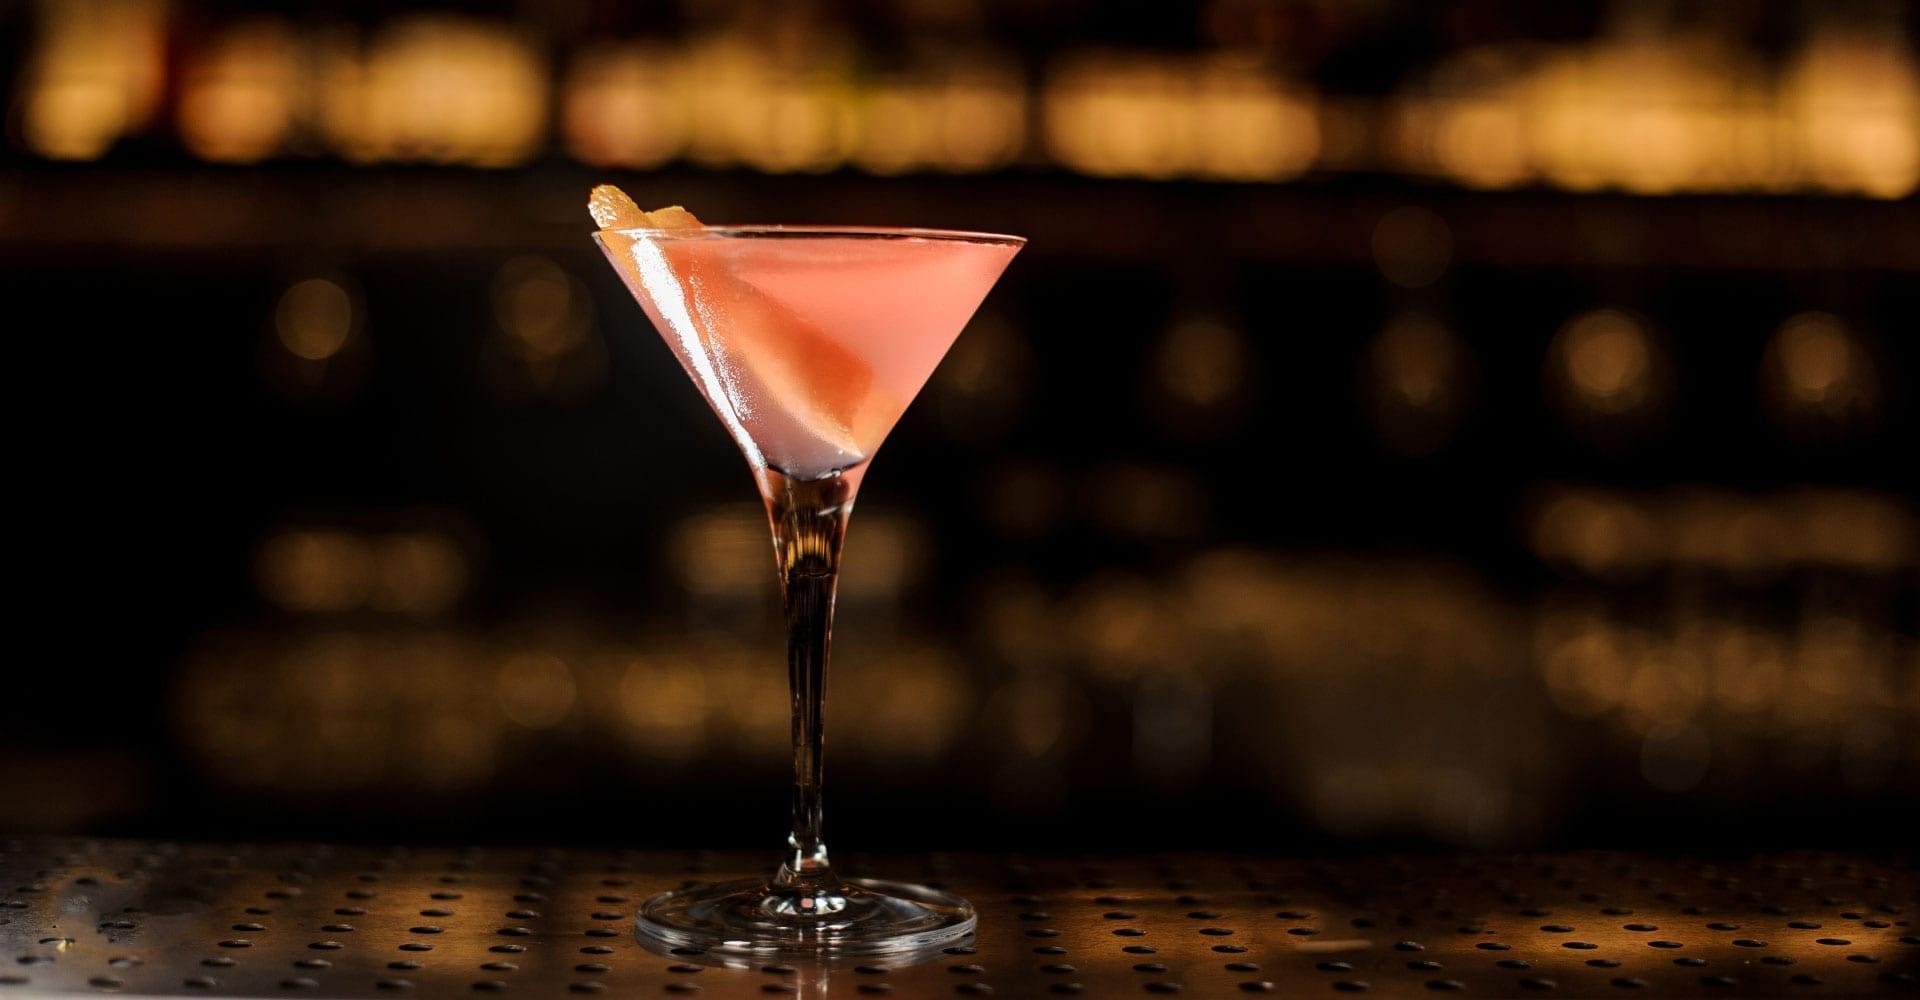 Bloomsbury Martini Licor43 | Mixology Online | Credit: Shutterstock